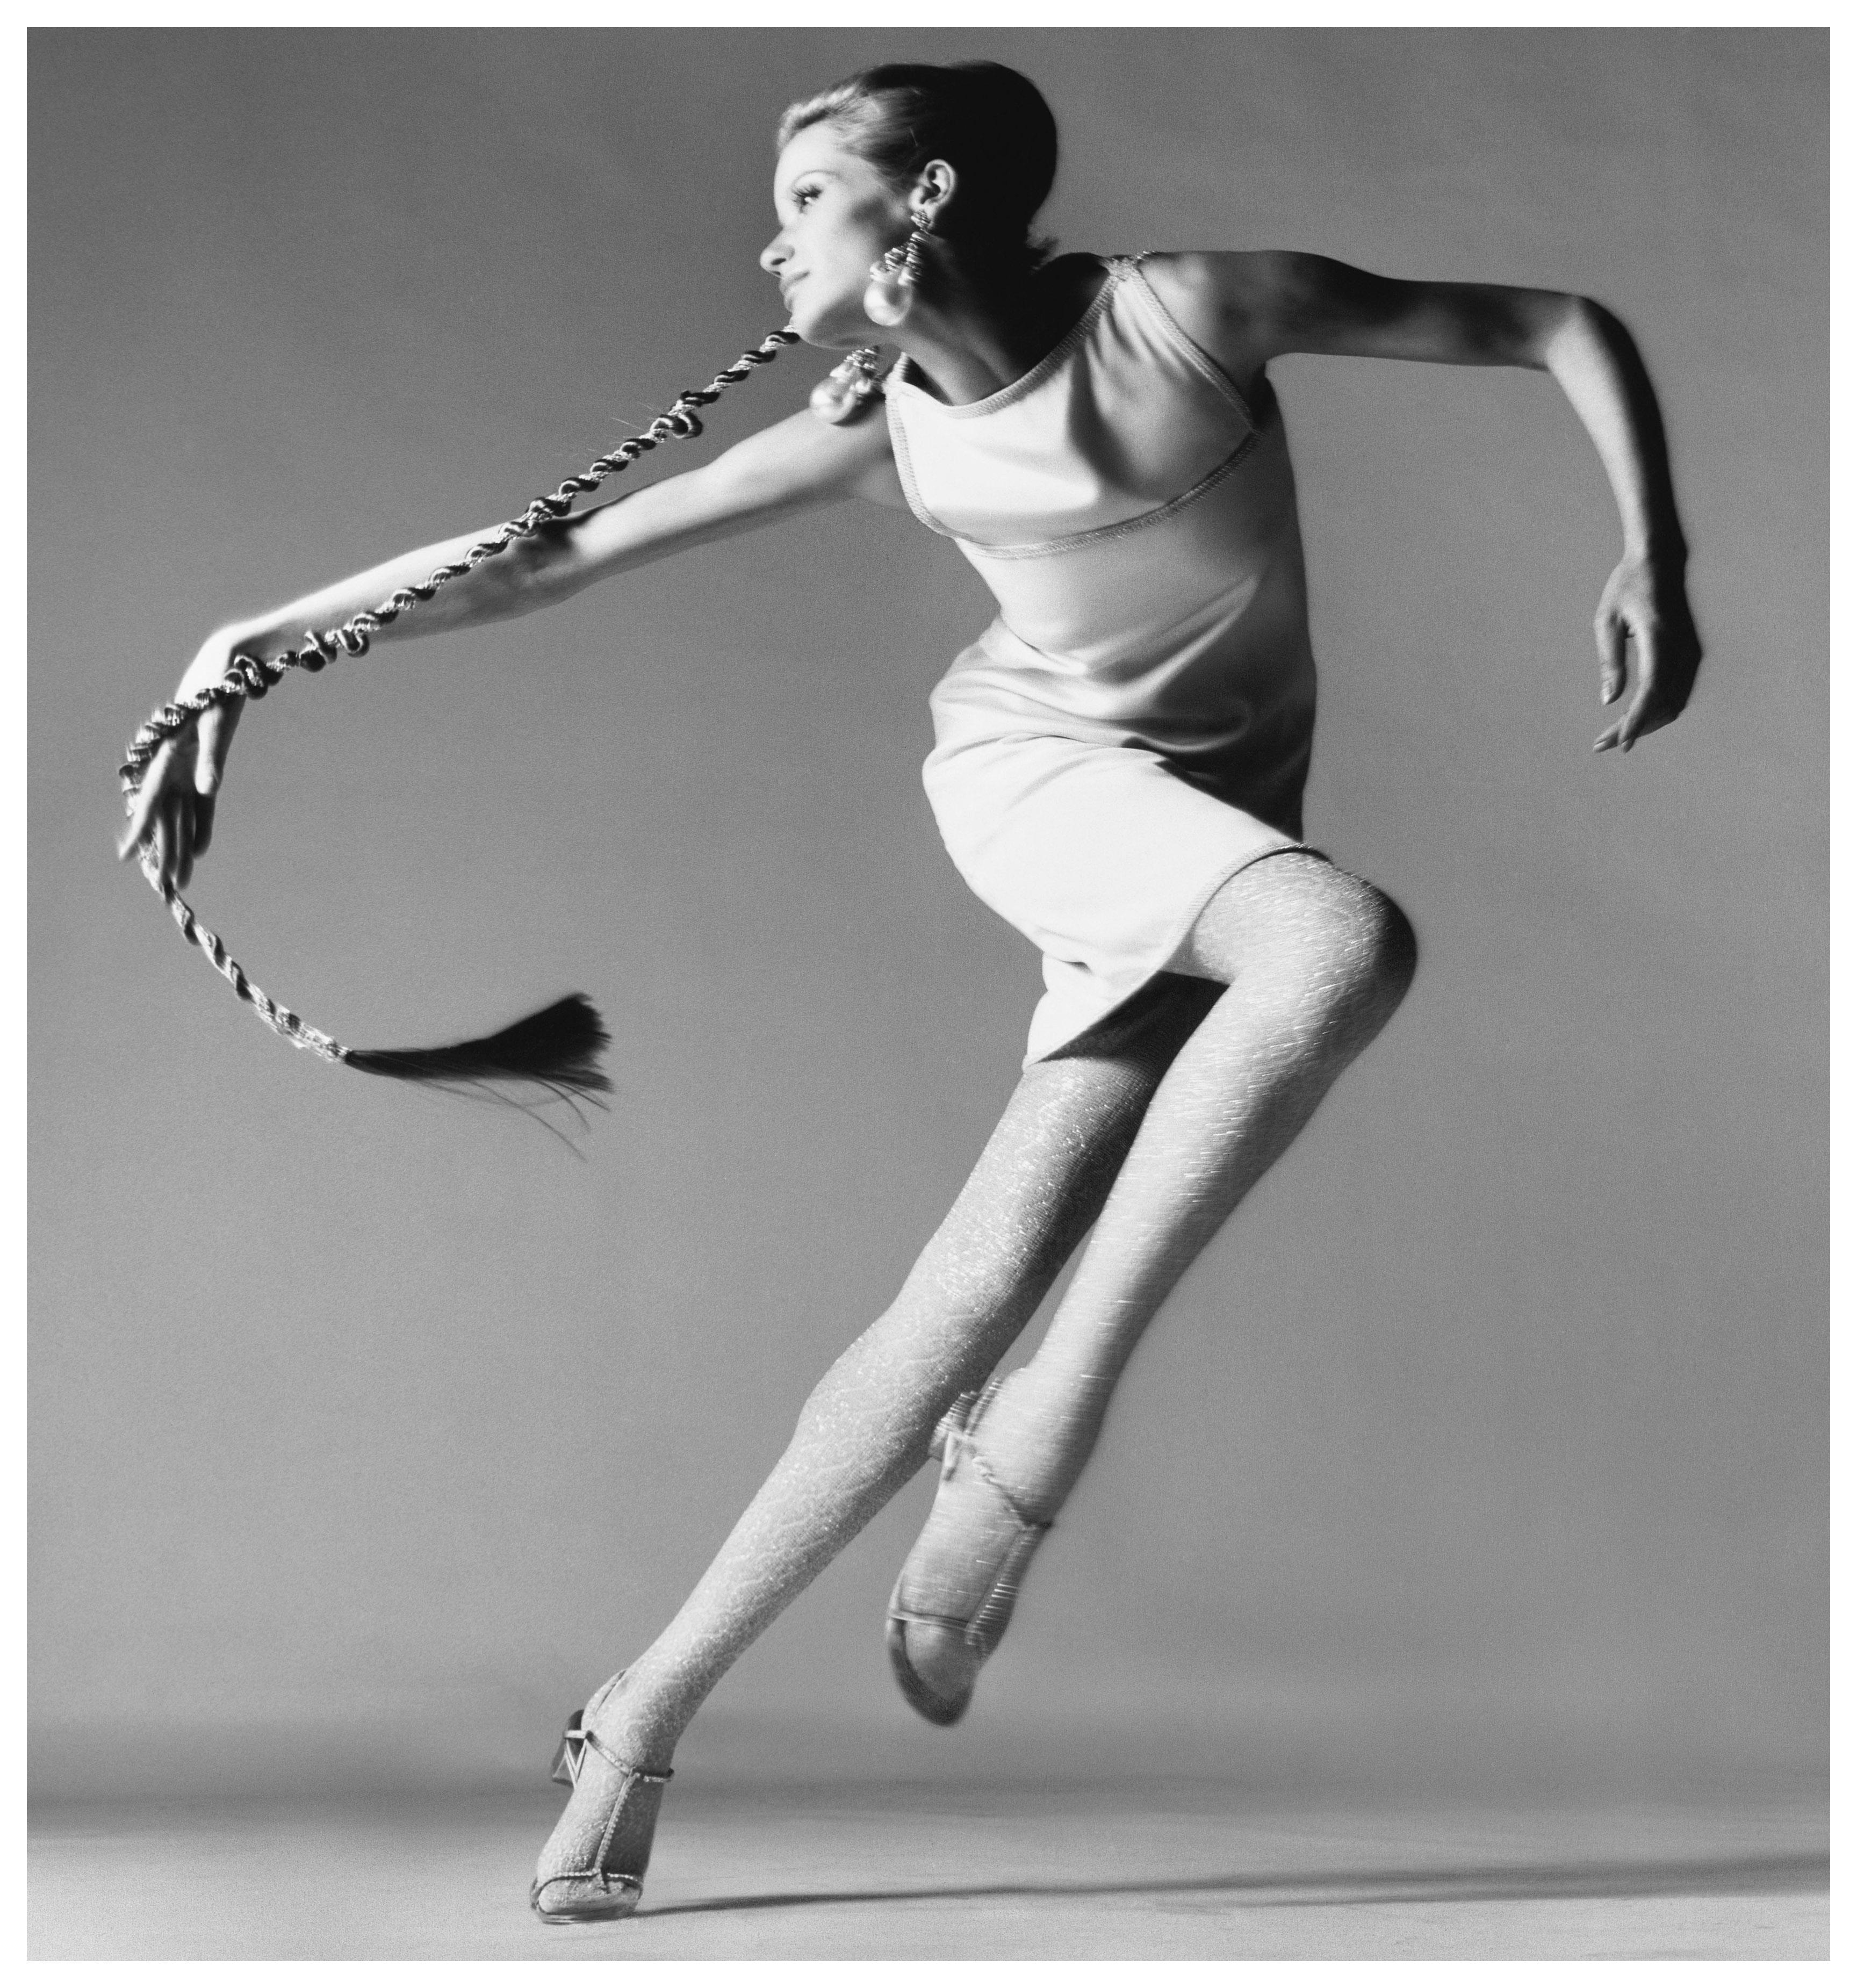 veruschka-dress-by-kimberly-new-york-january-1967-c2a0richard-avedon.jpg